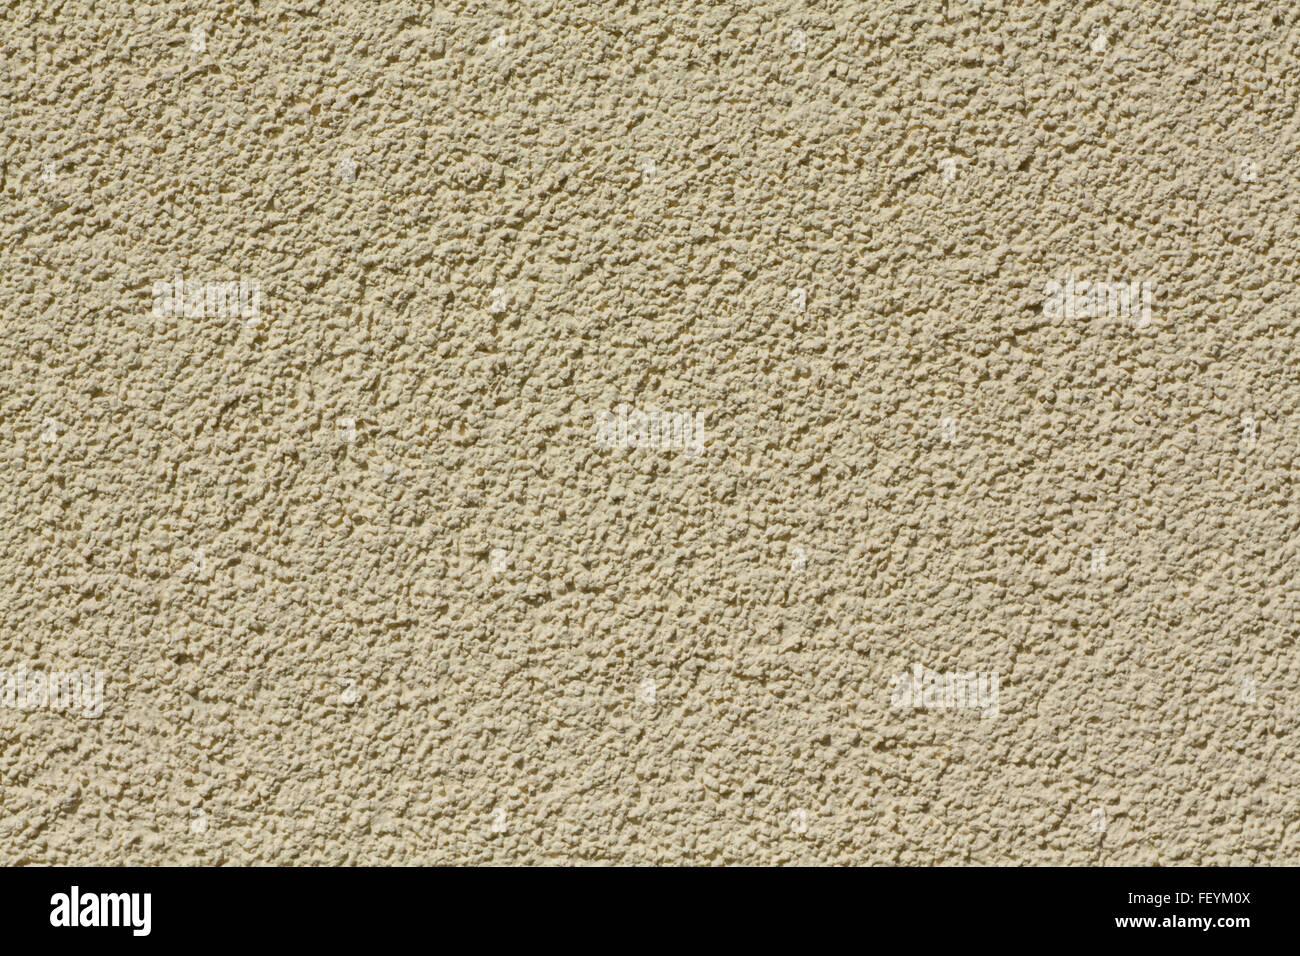 Intonaco Esterno Moderno : Intonaco moderno rinzaffo muro texture di sfondo foto